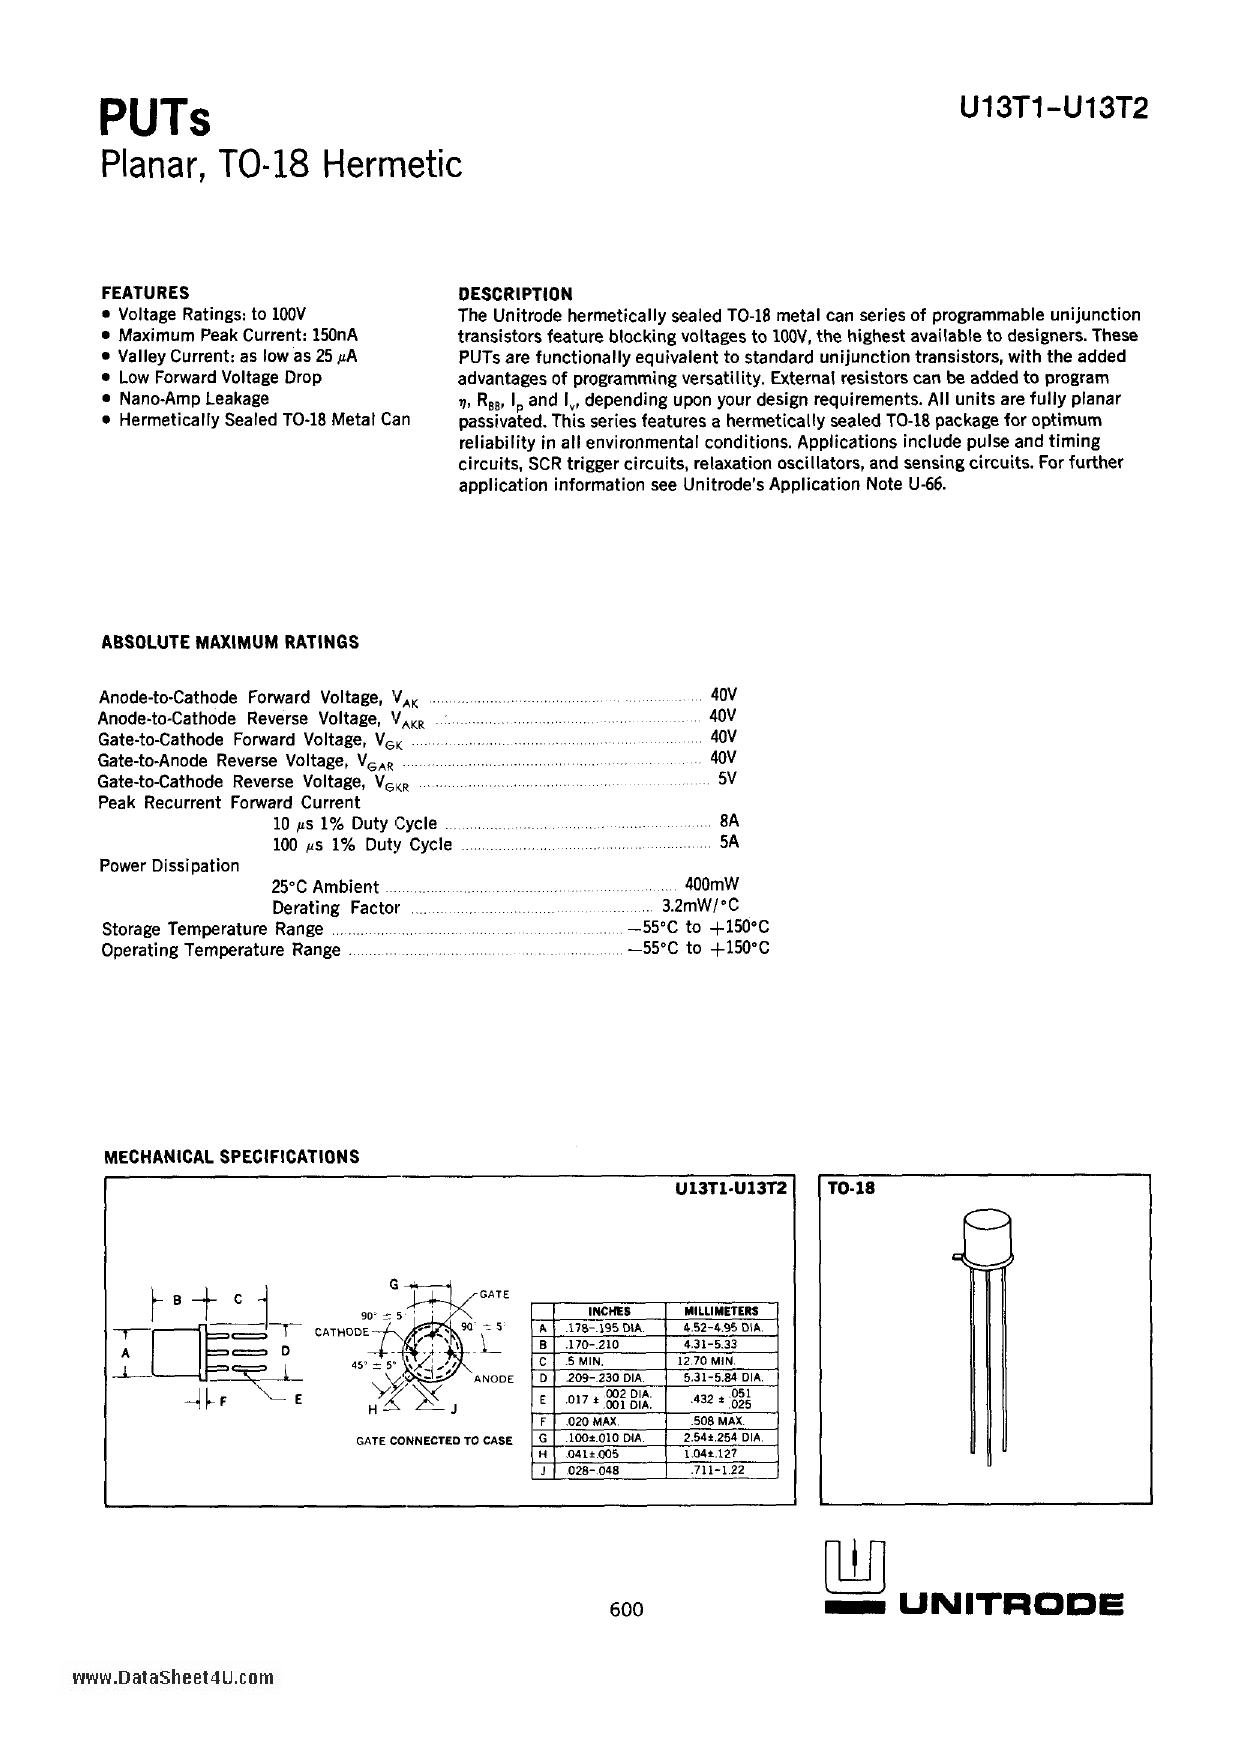 U13T1 datasheet